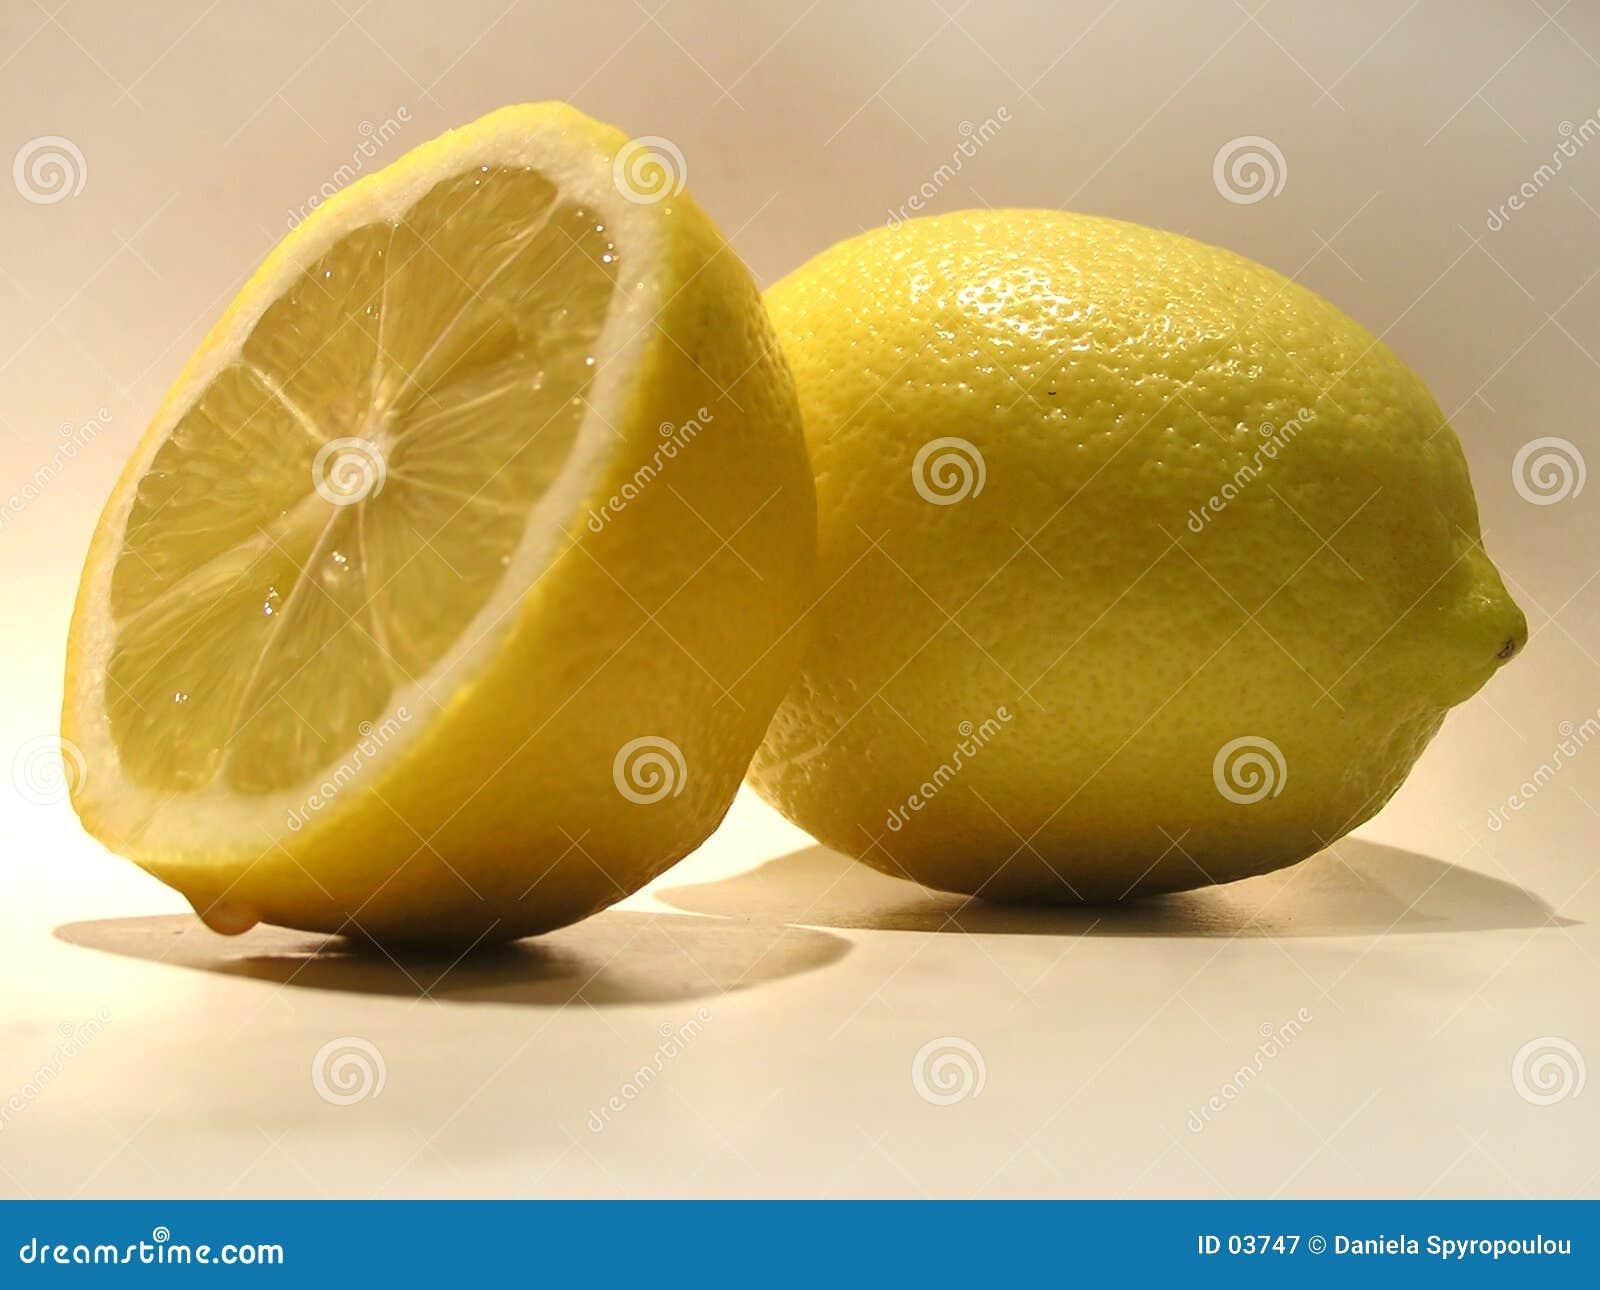 Download 柠檬 库存图片. 图片 包括有 次幂, 金子, 维生素, 概念, 水多, 制动手, 液体 - 3747